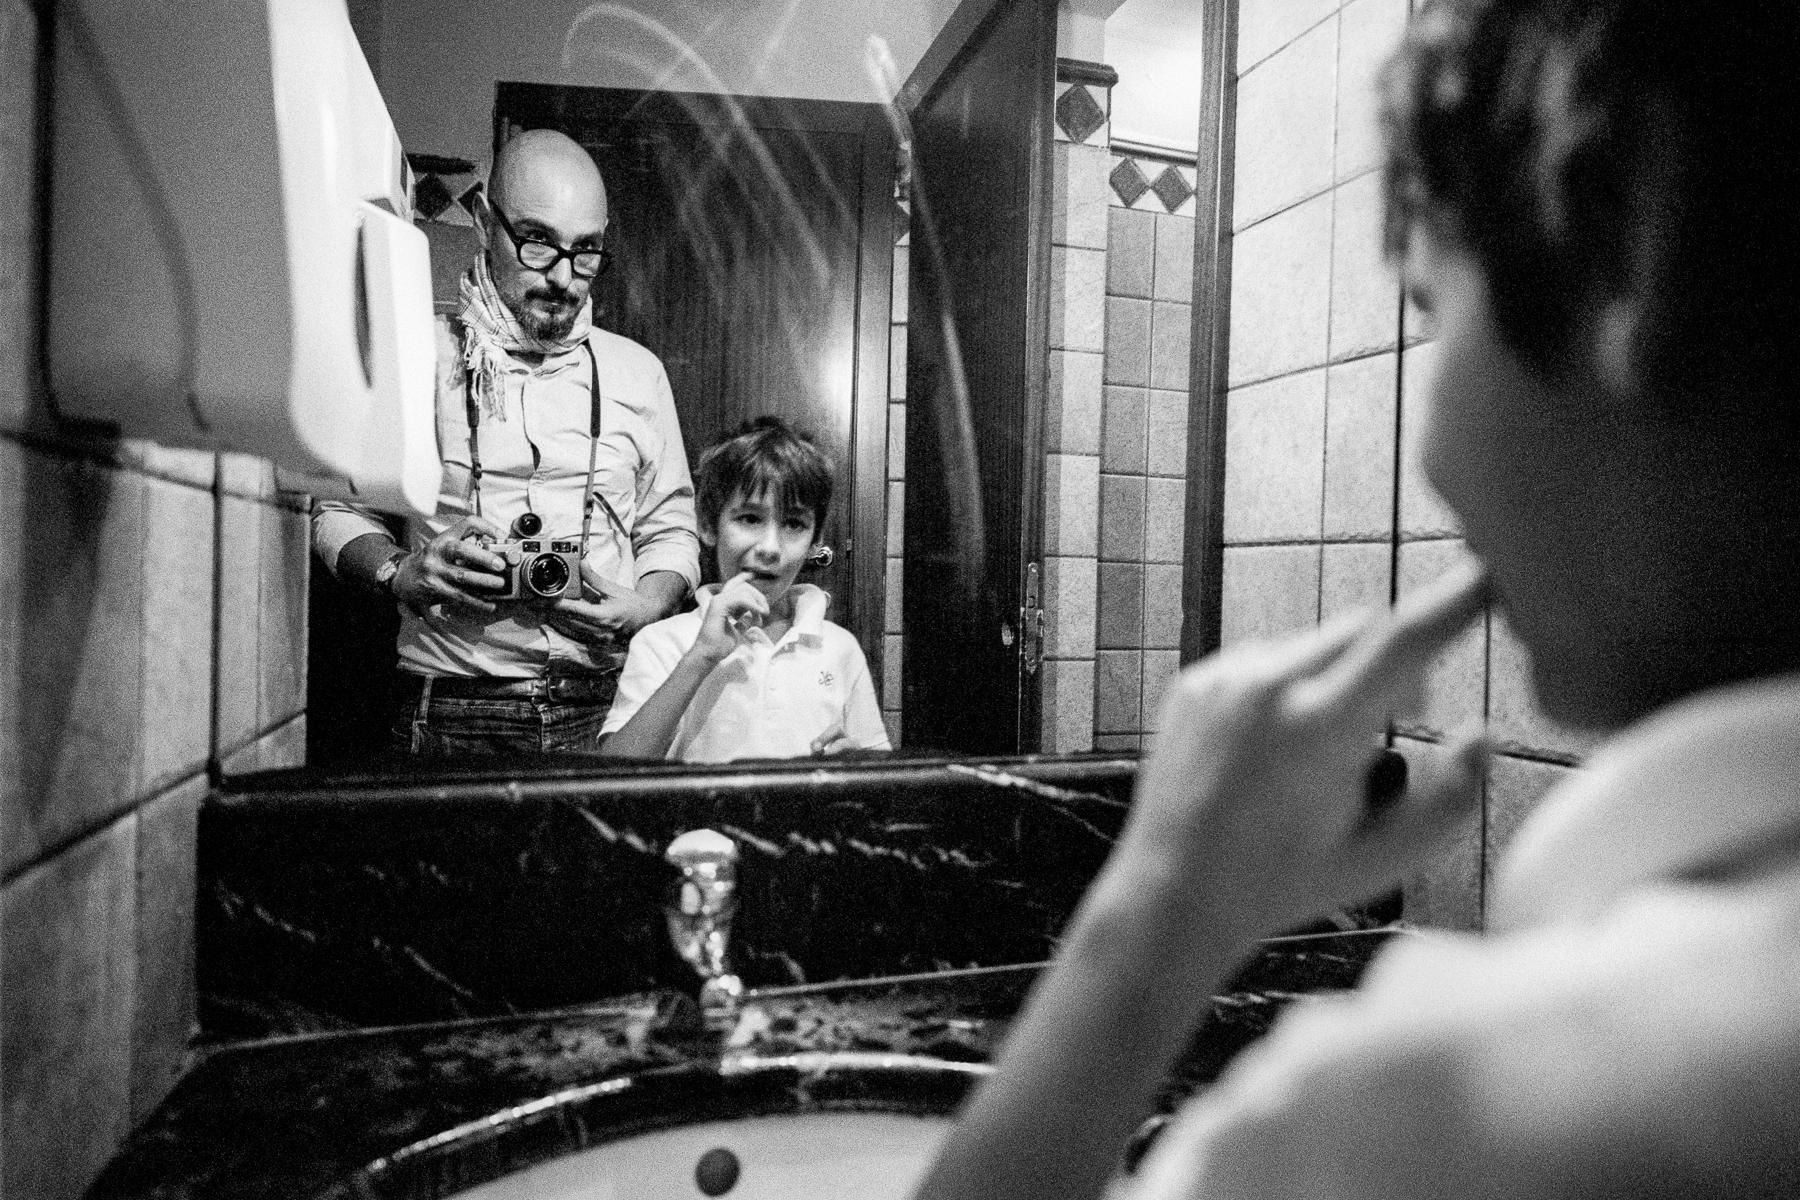 son and myself (checking teeth grow) | contax g2 21 mm | Agfa Apx 400 | Emanuele Bertoni